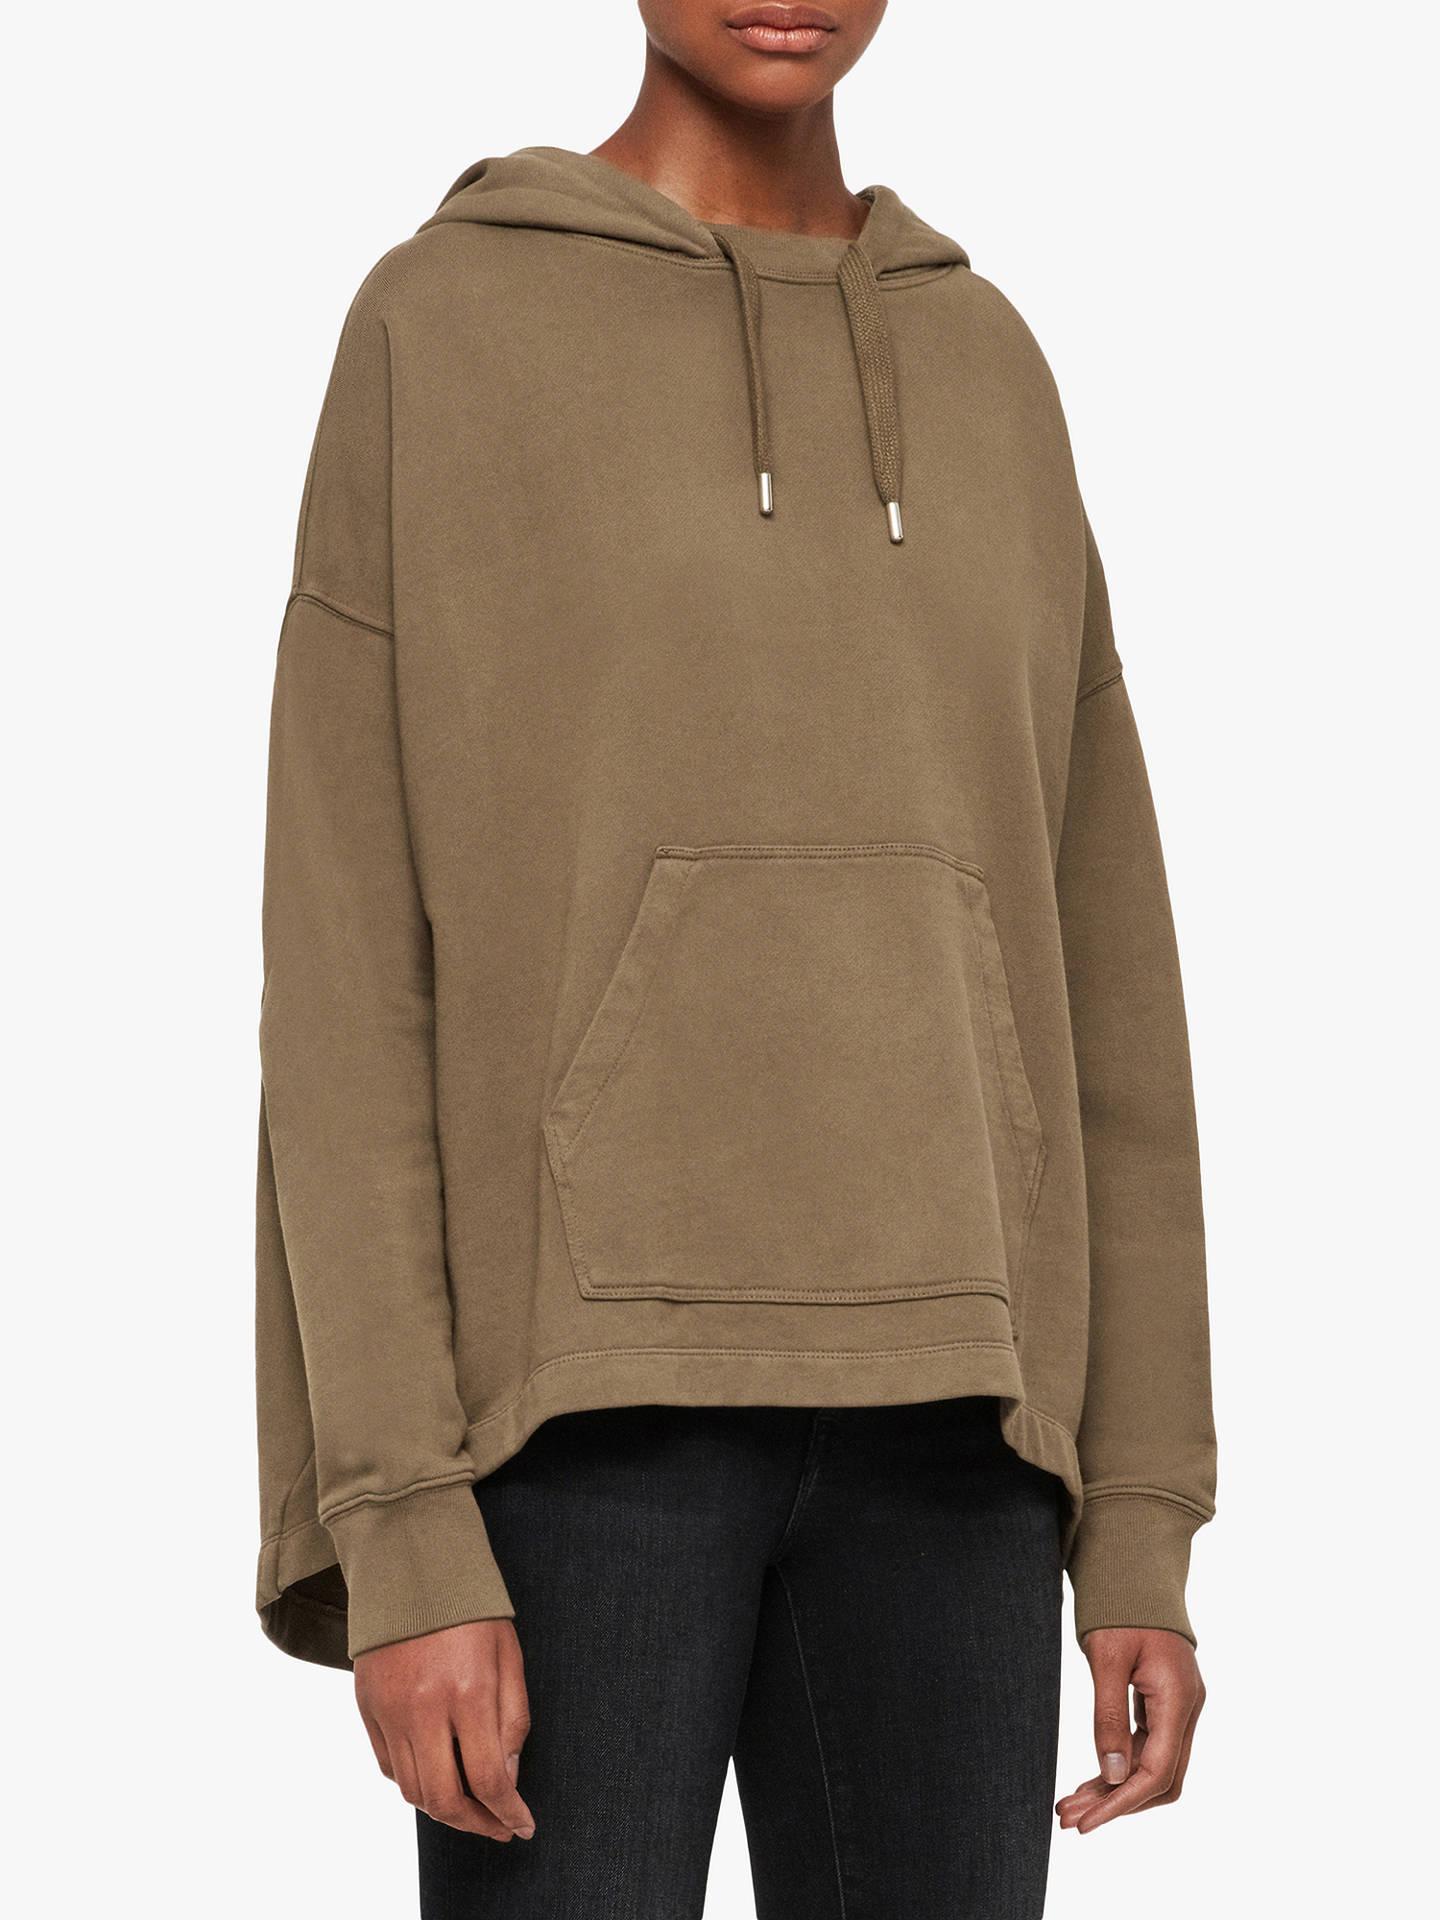 allsaints-etienne-cotton-oversized-hoodie,-khaki-green by allsaints